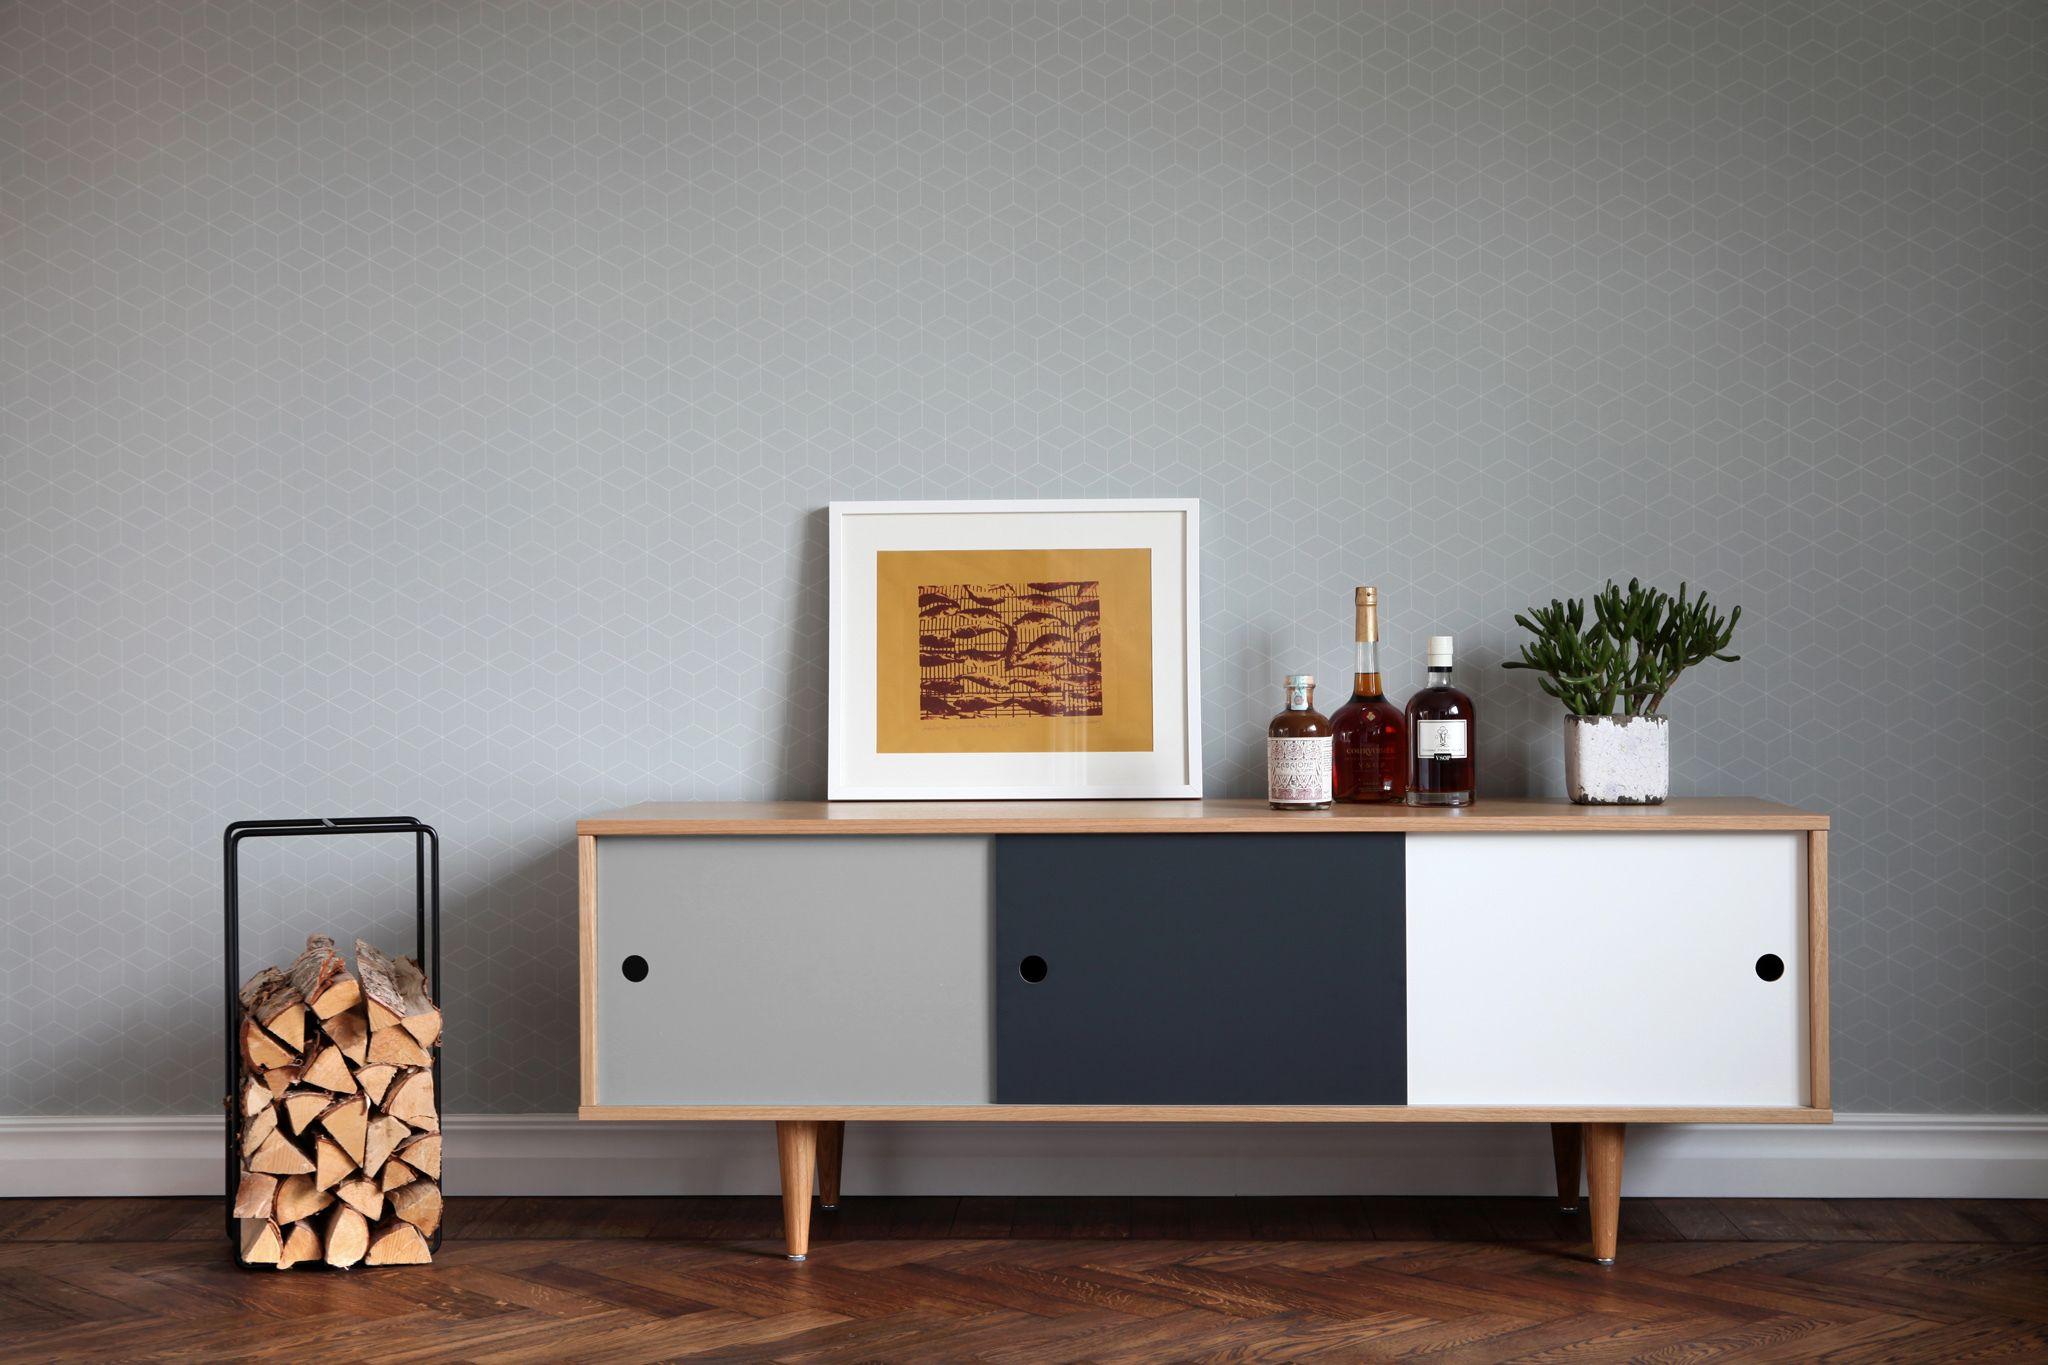 Sideboard Skandinavisches Design Retro With Images Retro